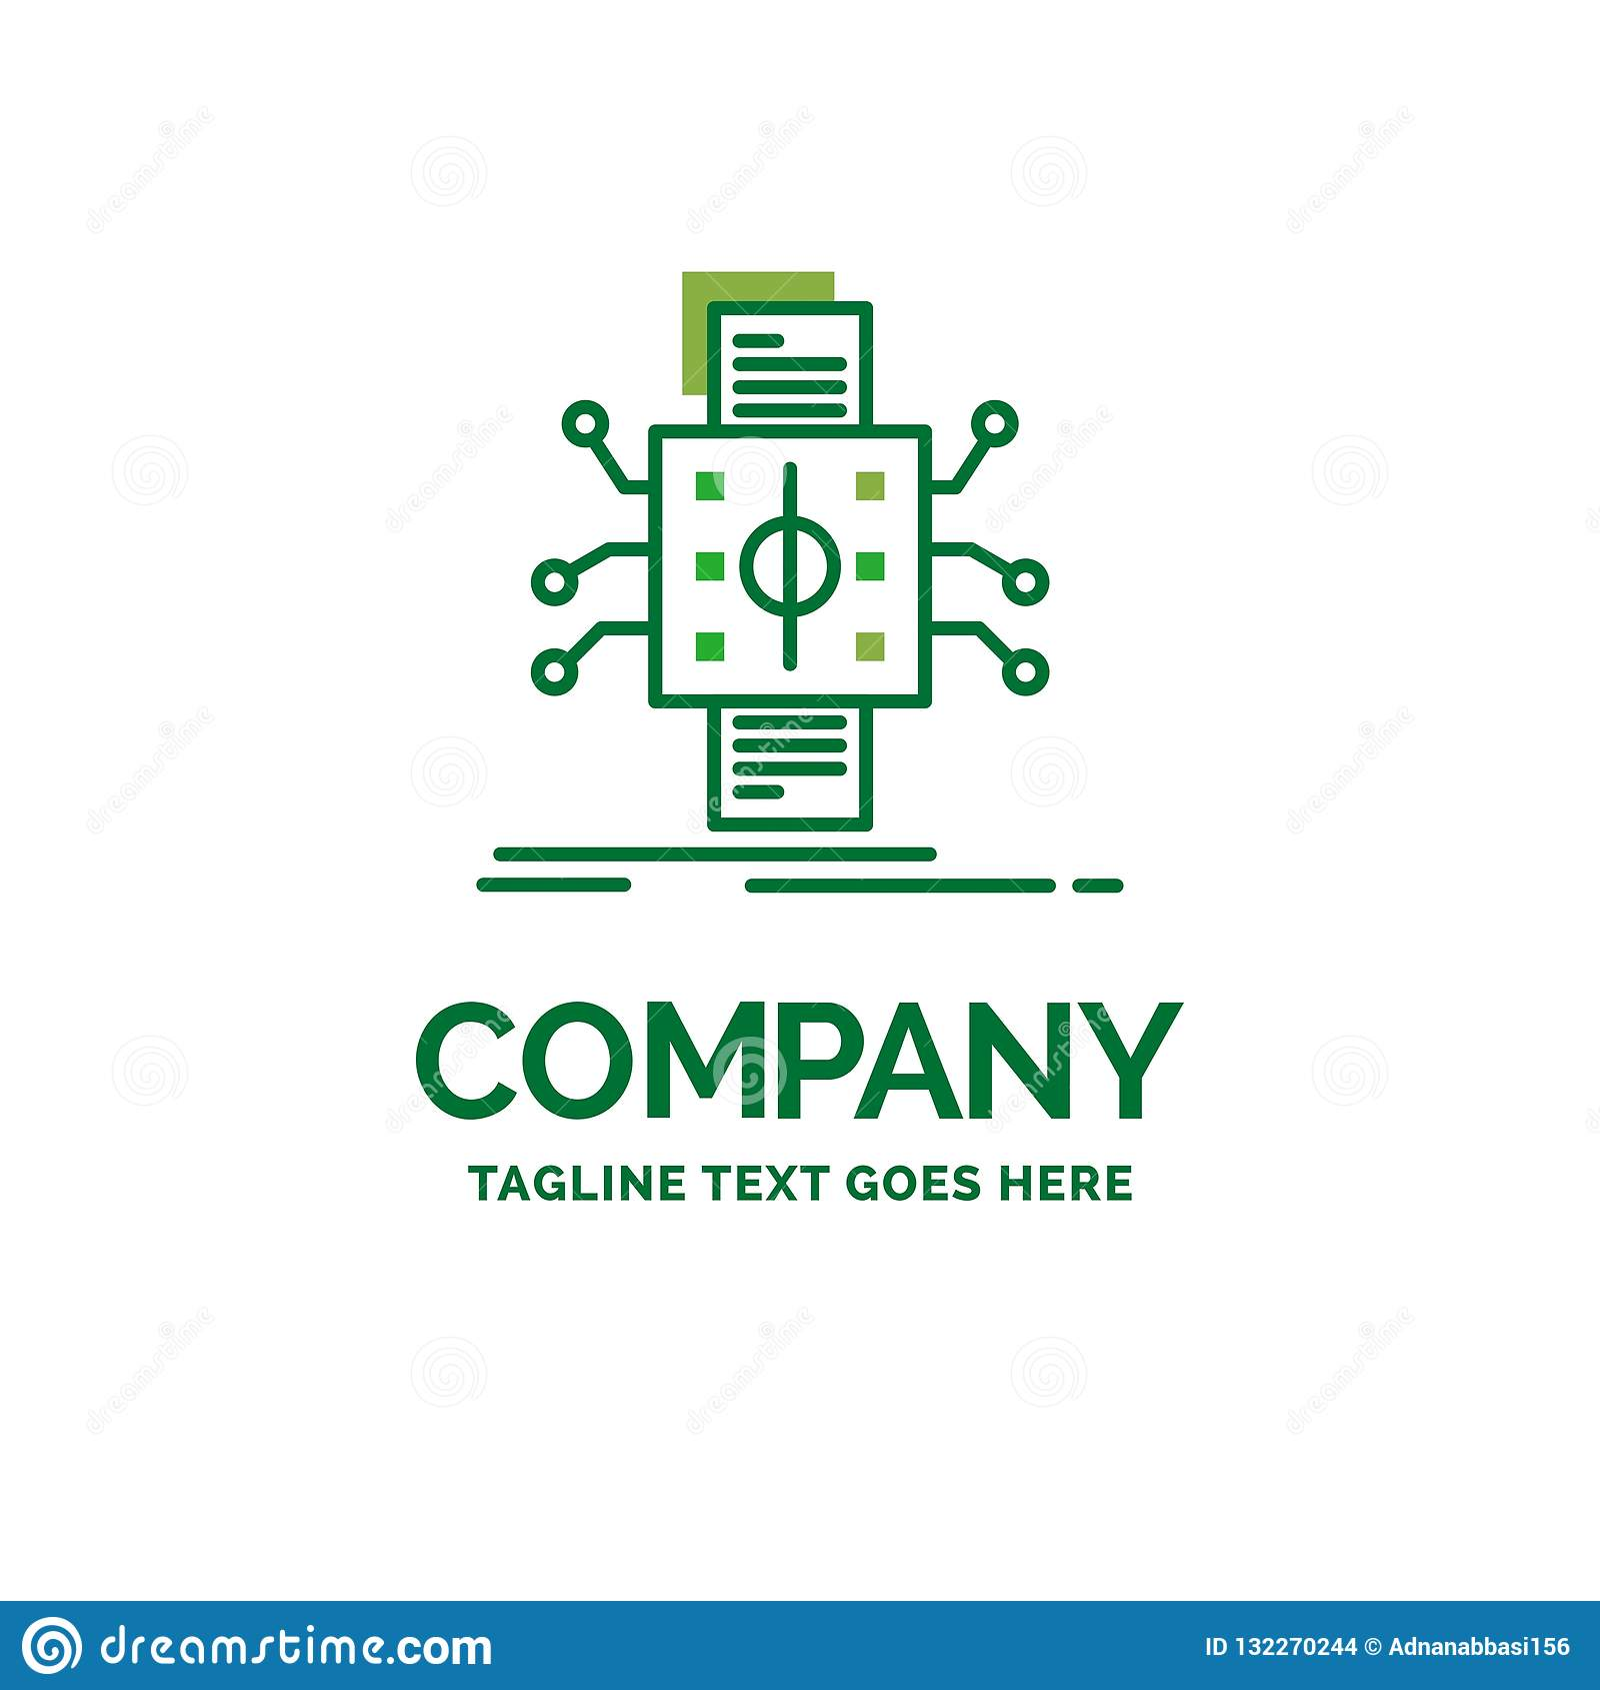 Analyse, gegevens die, gegeven, verwerking, Vlak Bedrijfsembleem melden